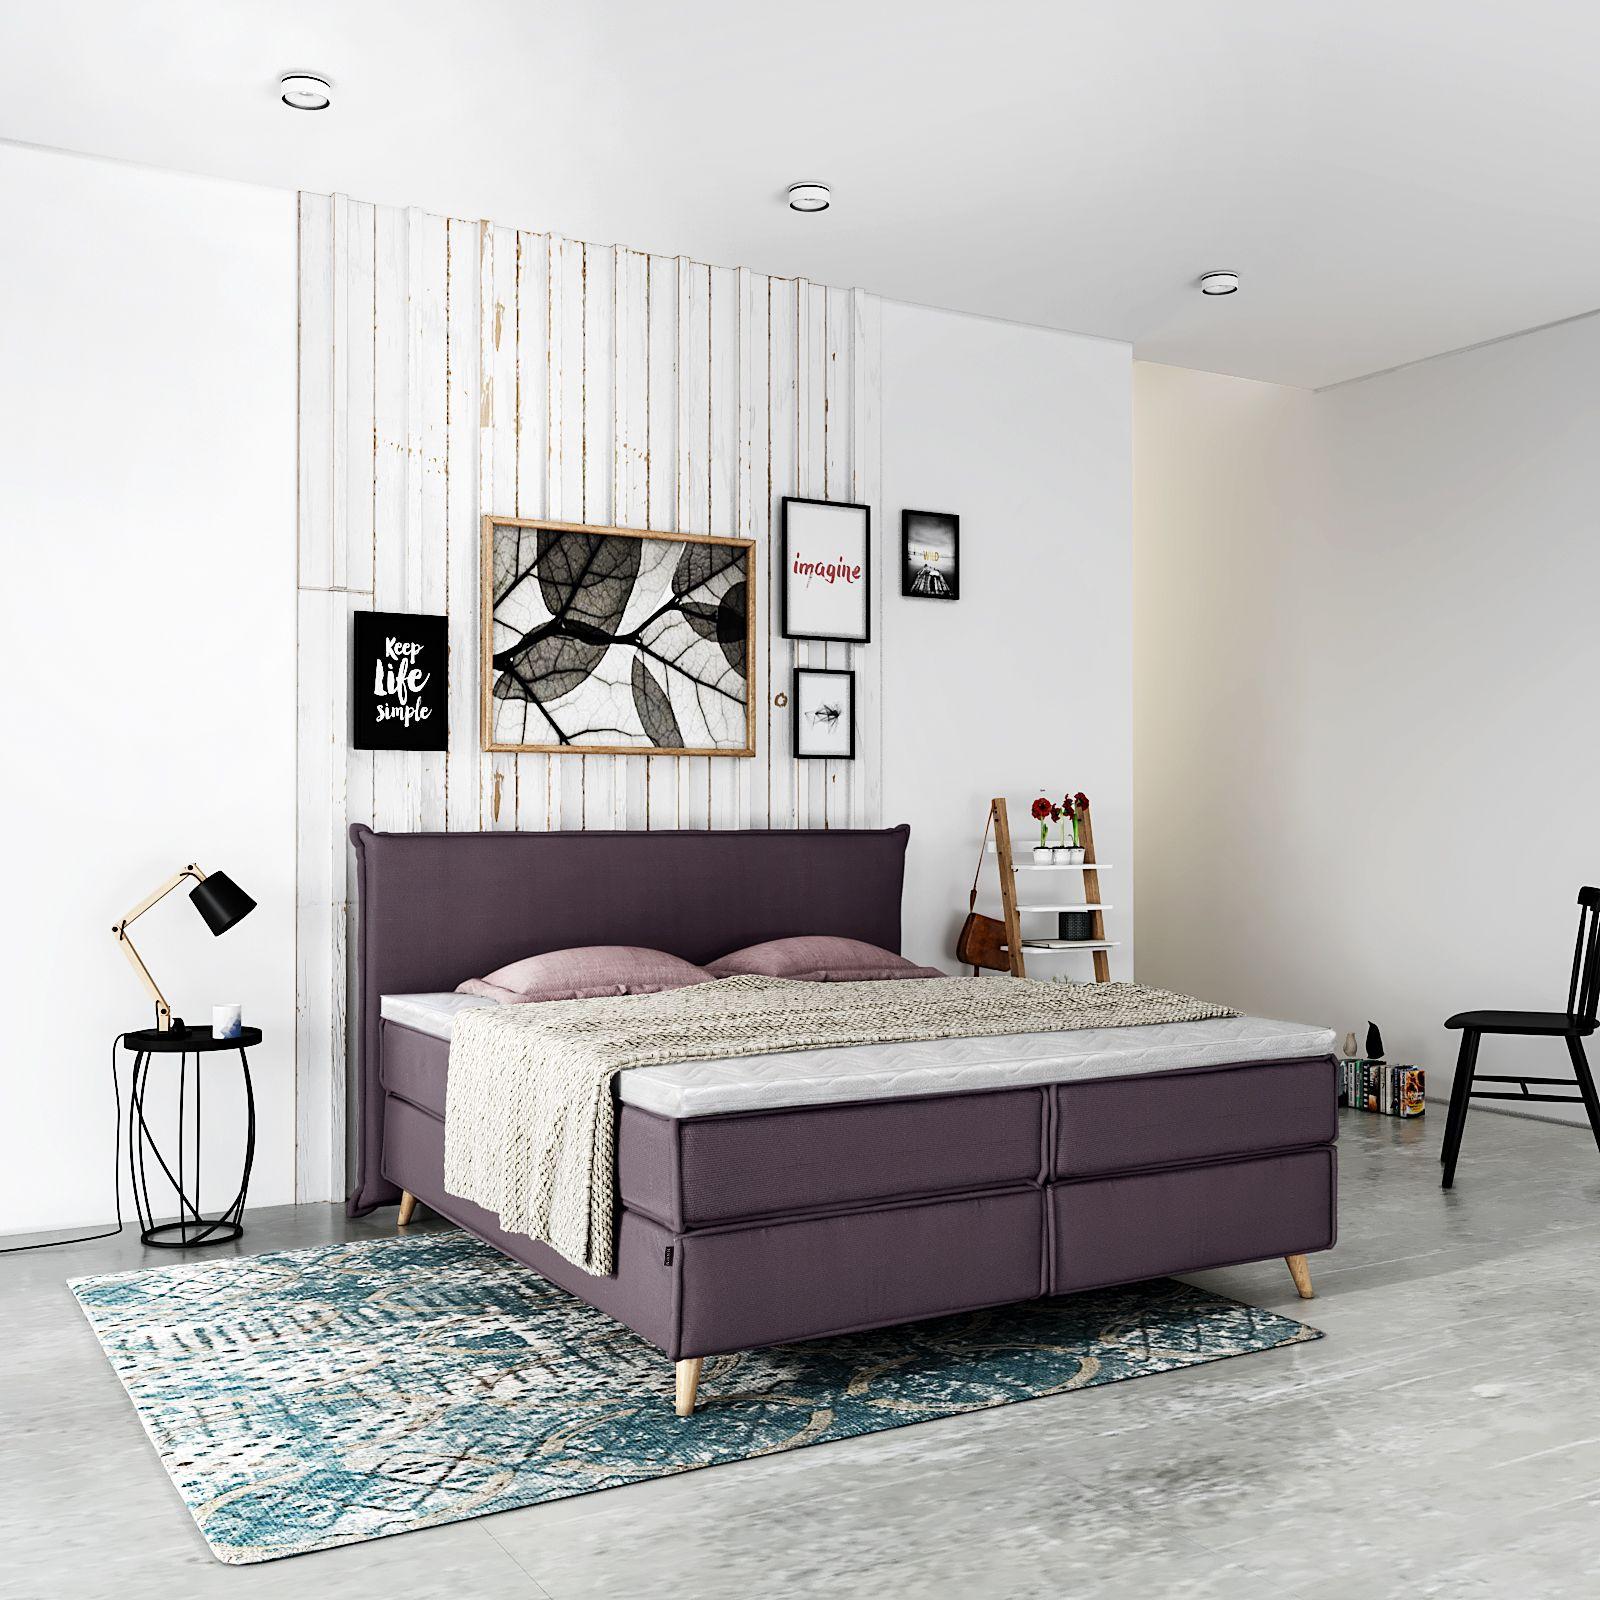 Boxspring Bed Insideout Free 180x200cm H2 Fabric Aubergine Oak Boxspringbett Zimmergestaltung Bett